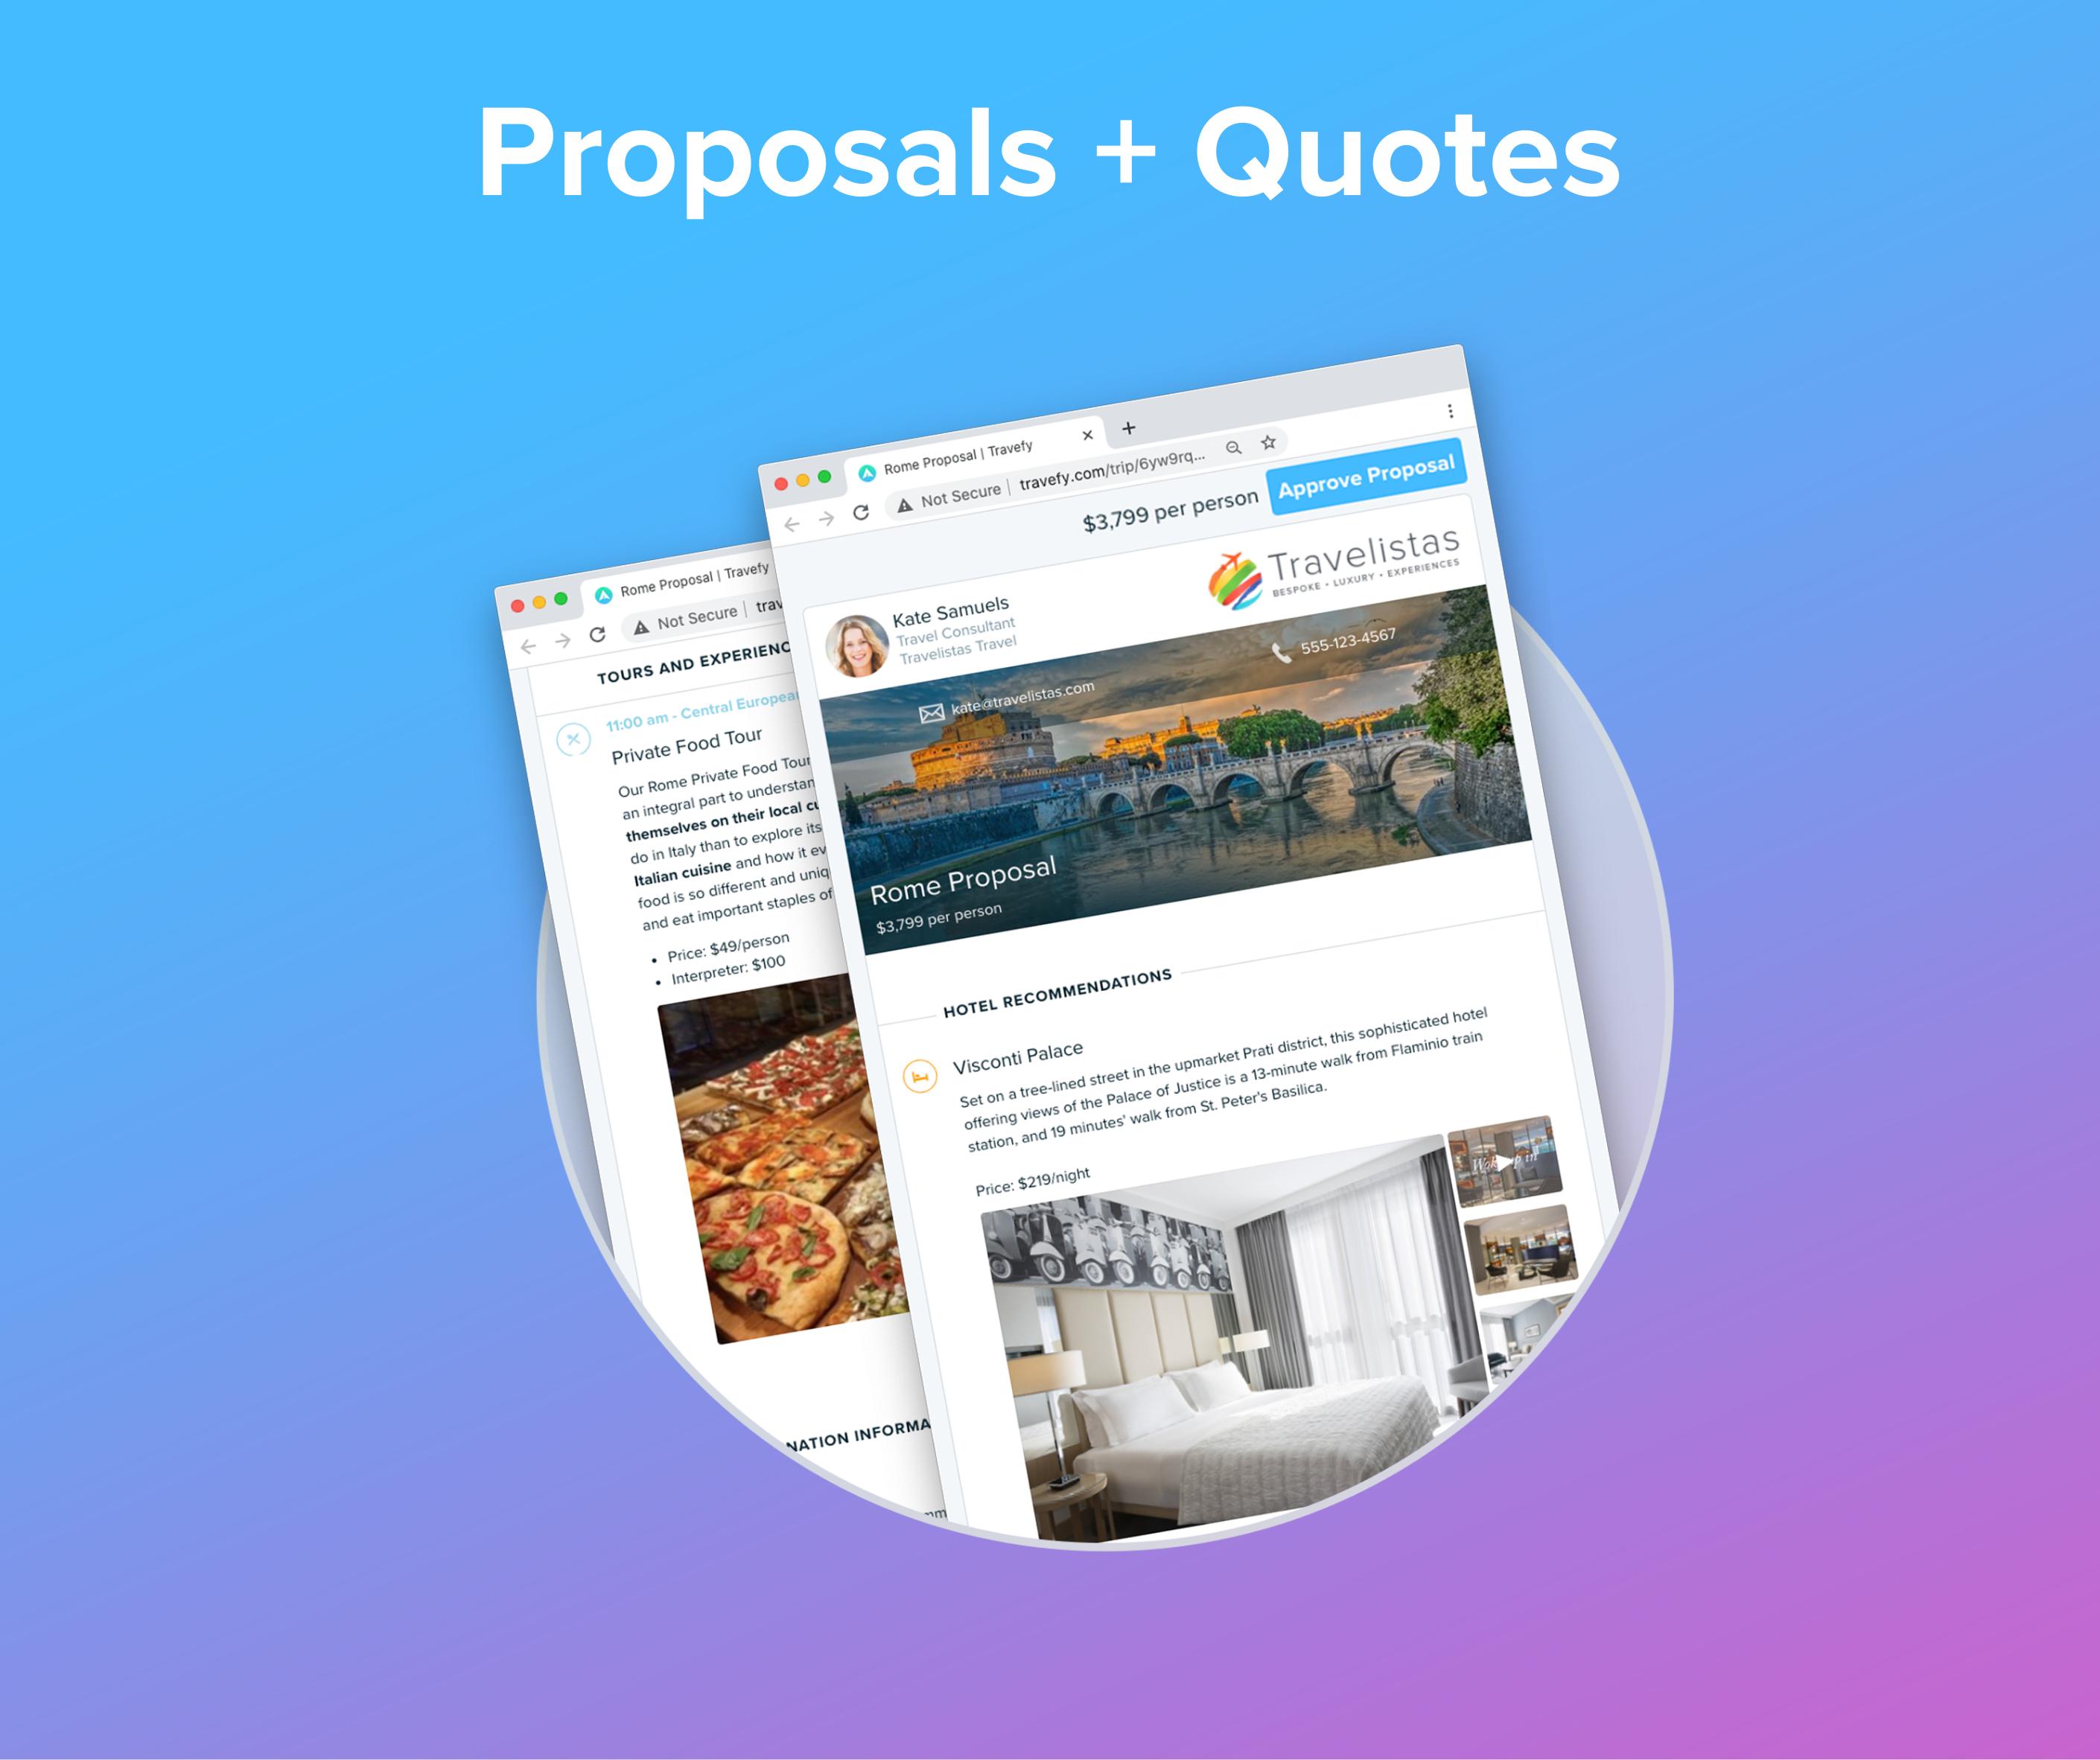 Proposals + Quotes